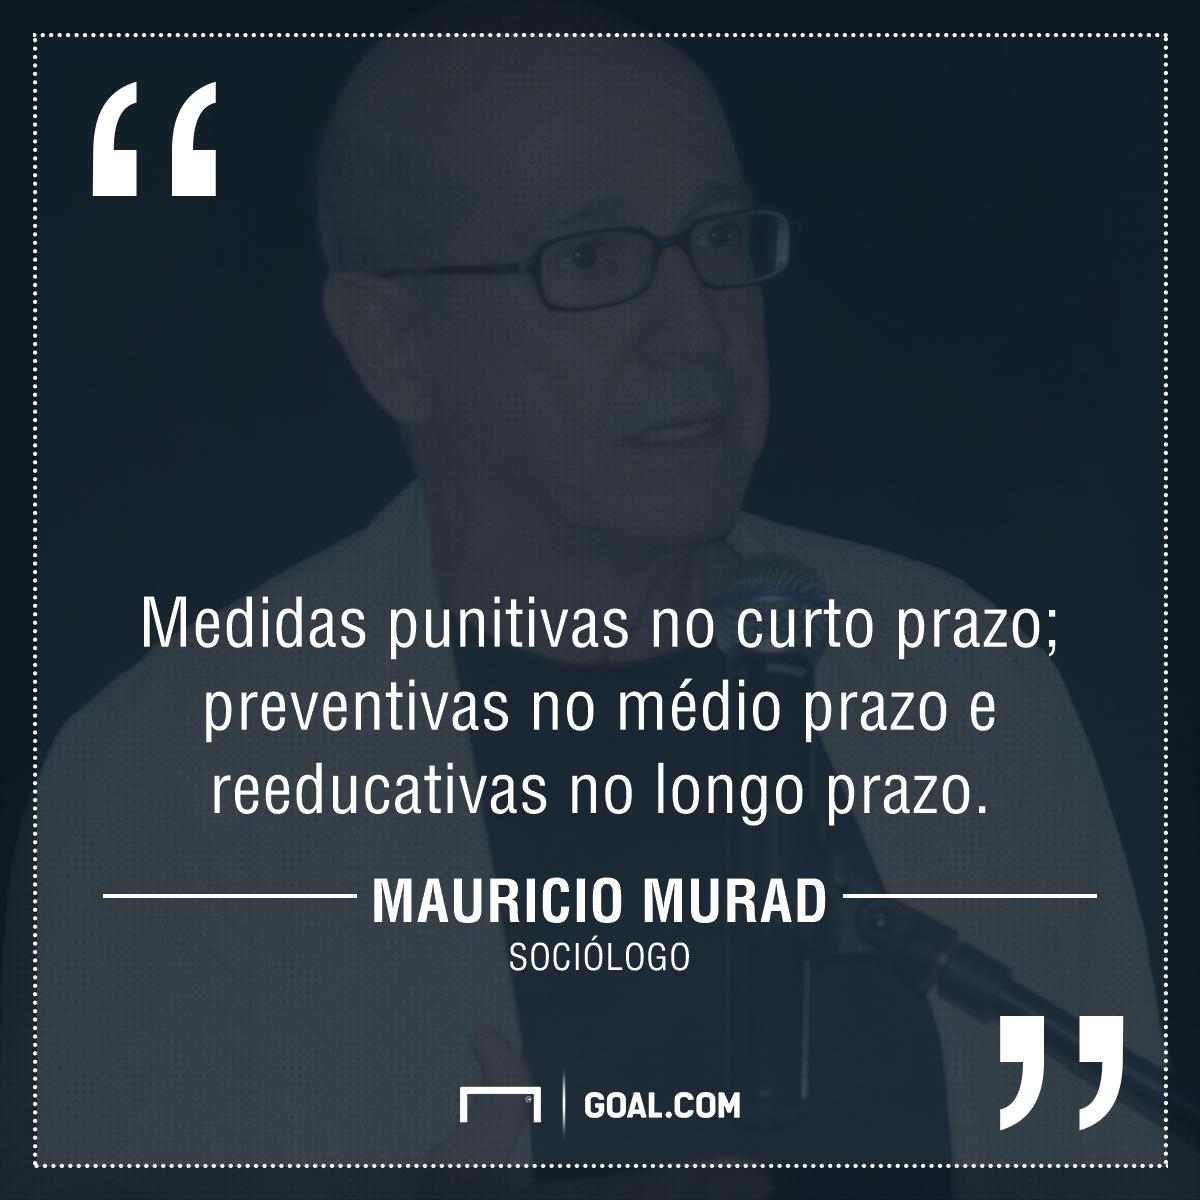 GFX Mauricio Murad